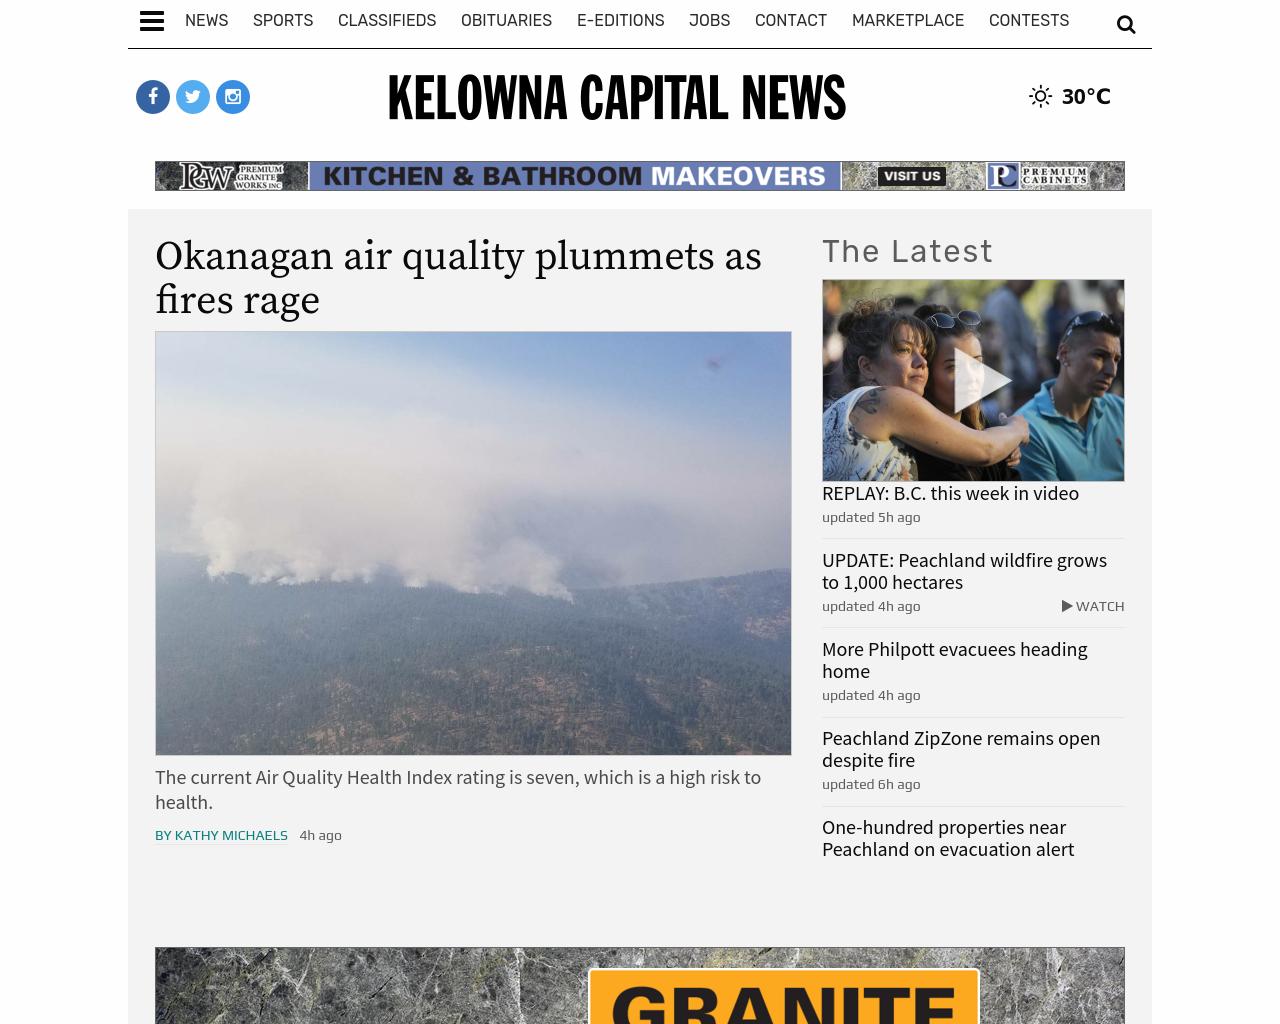 Kelowna-Capital-News-Advertising-Reviews-Pricing